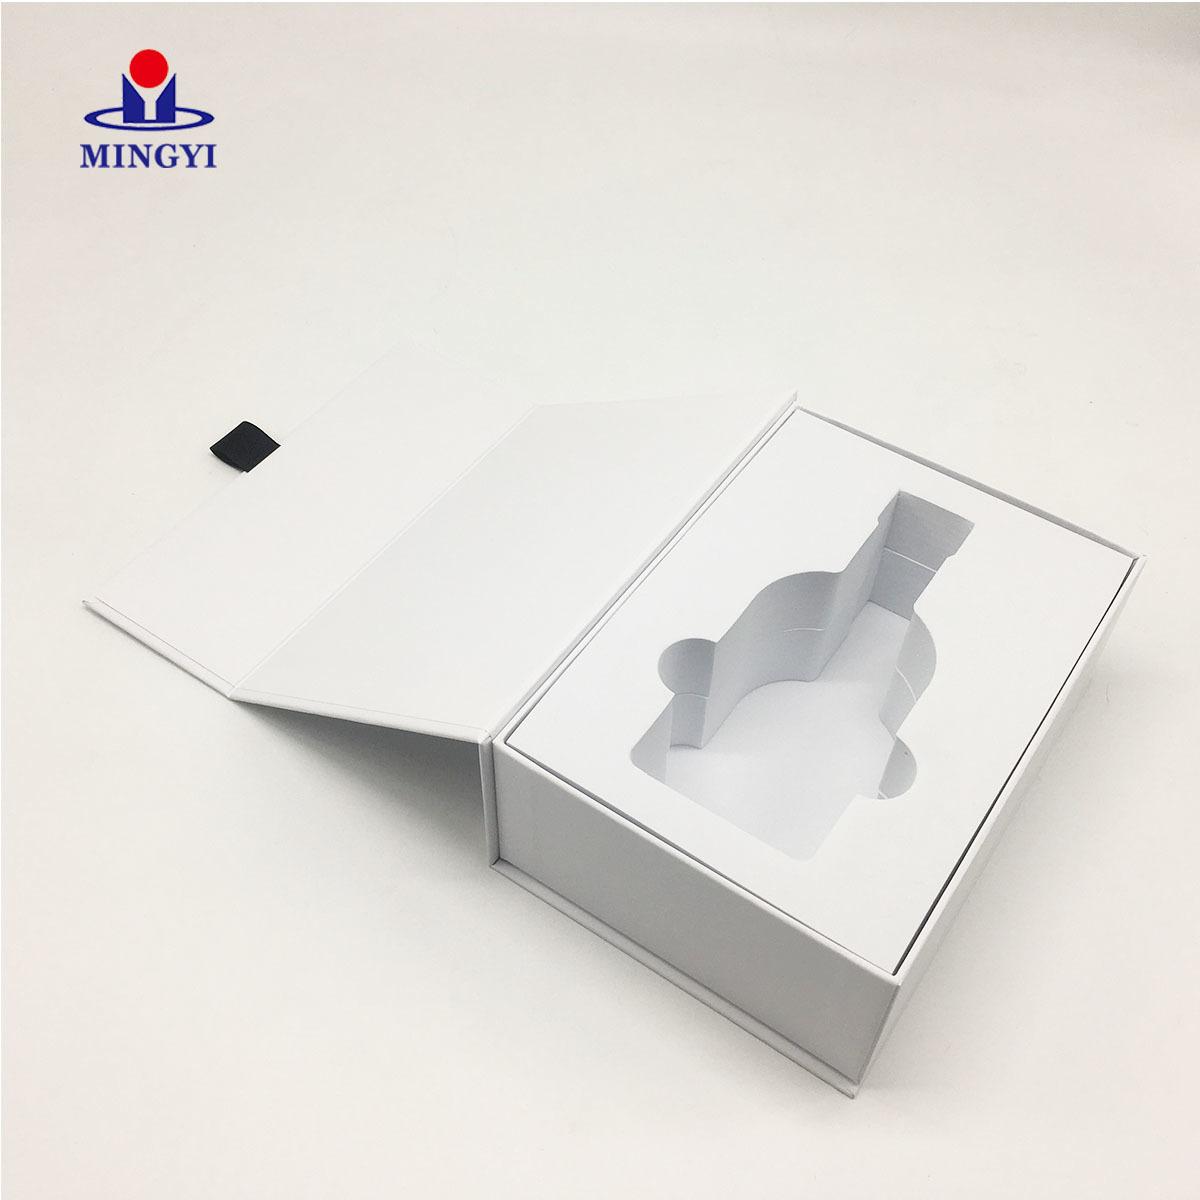 pet commodity hard gift boxes Mingyi Printing Brand